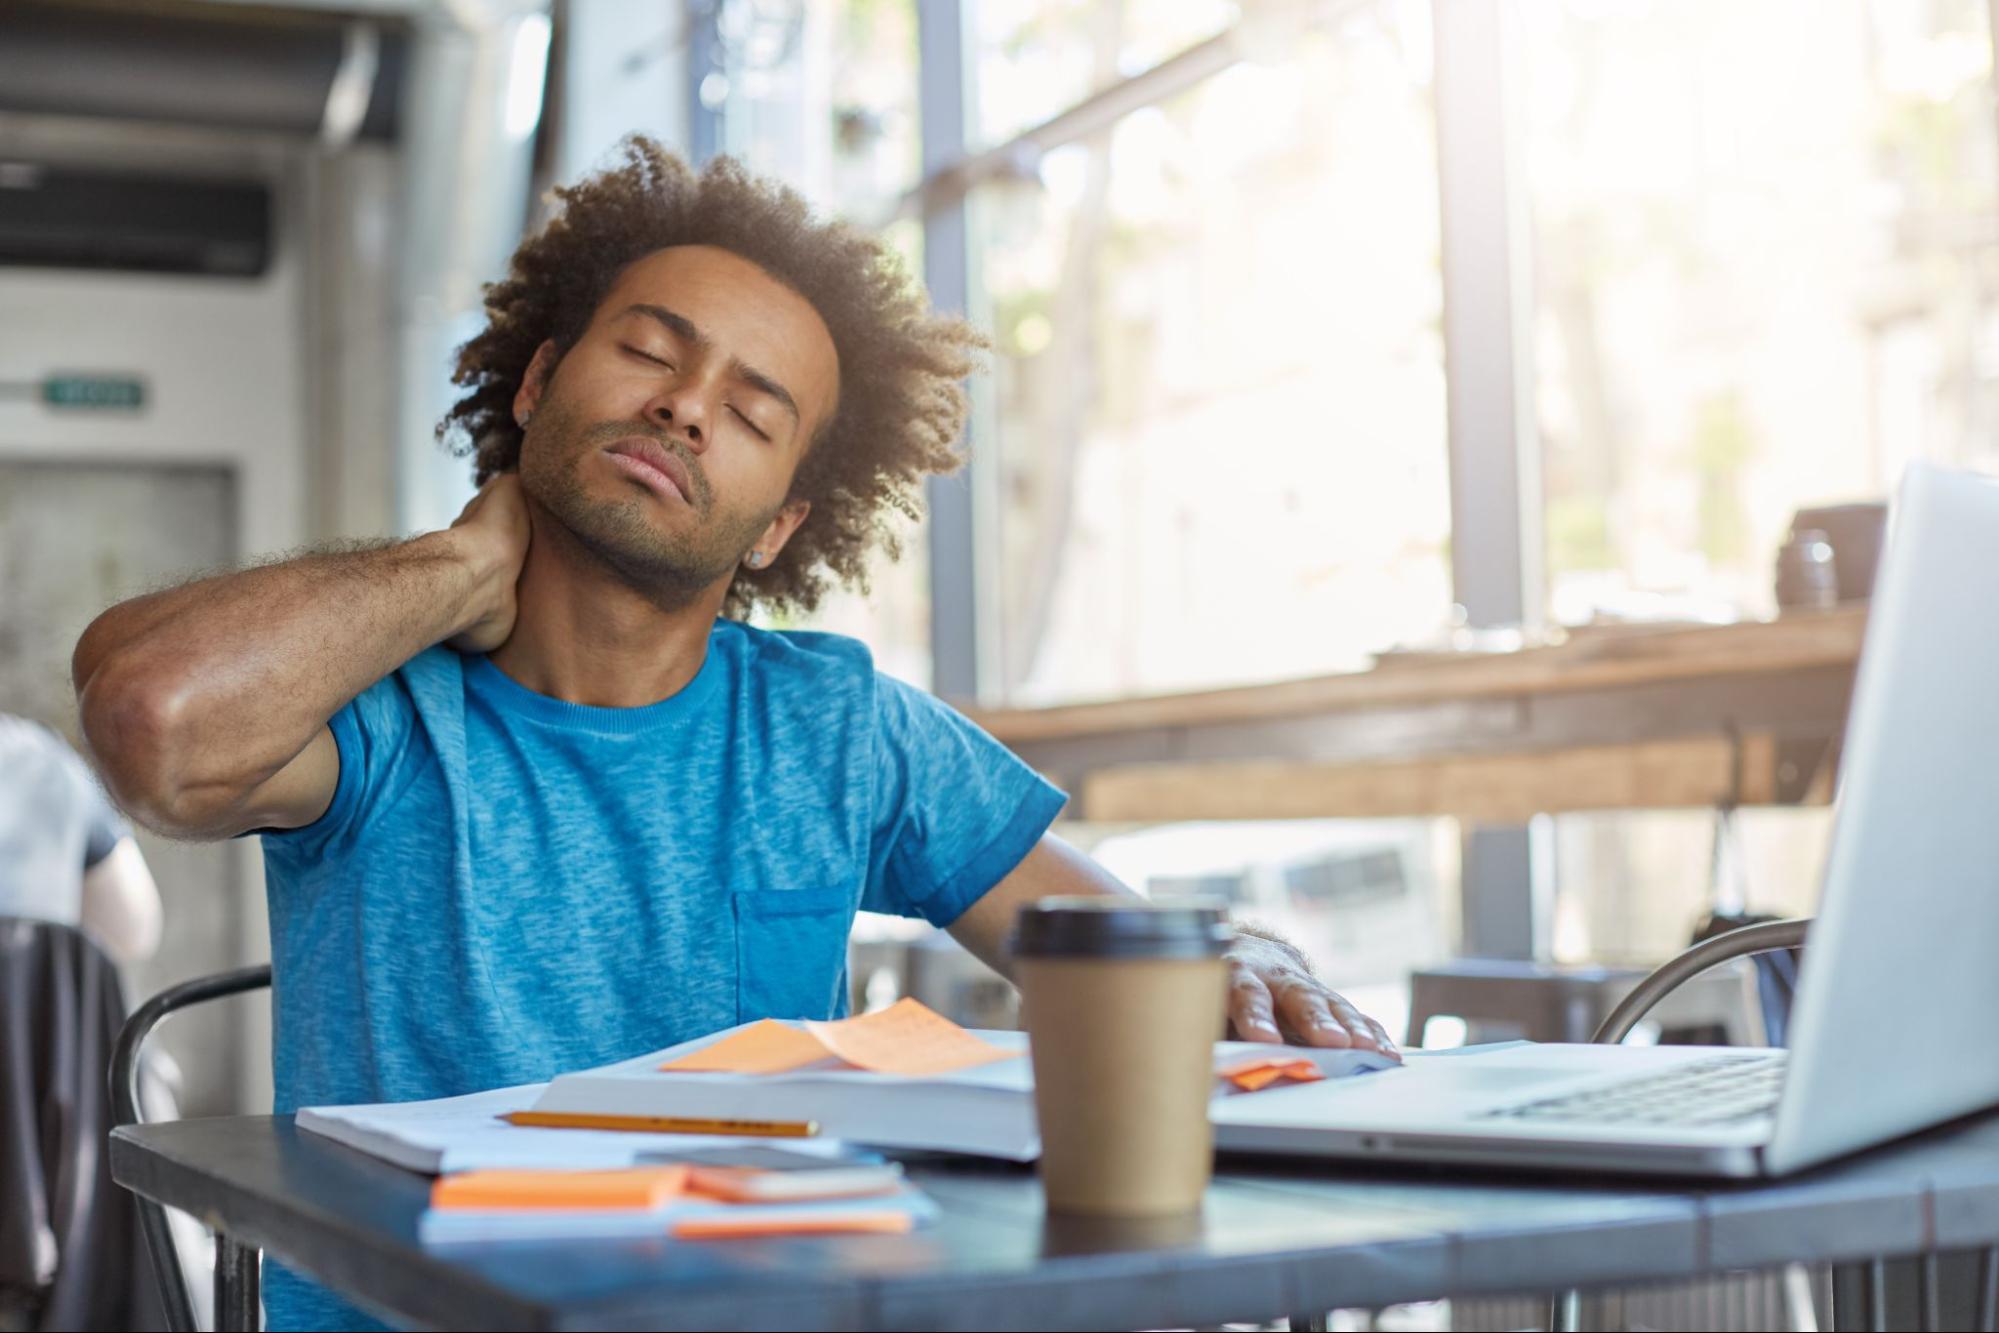 lugar-de-trabajo-mas-saludable-diseno-ergonomico